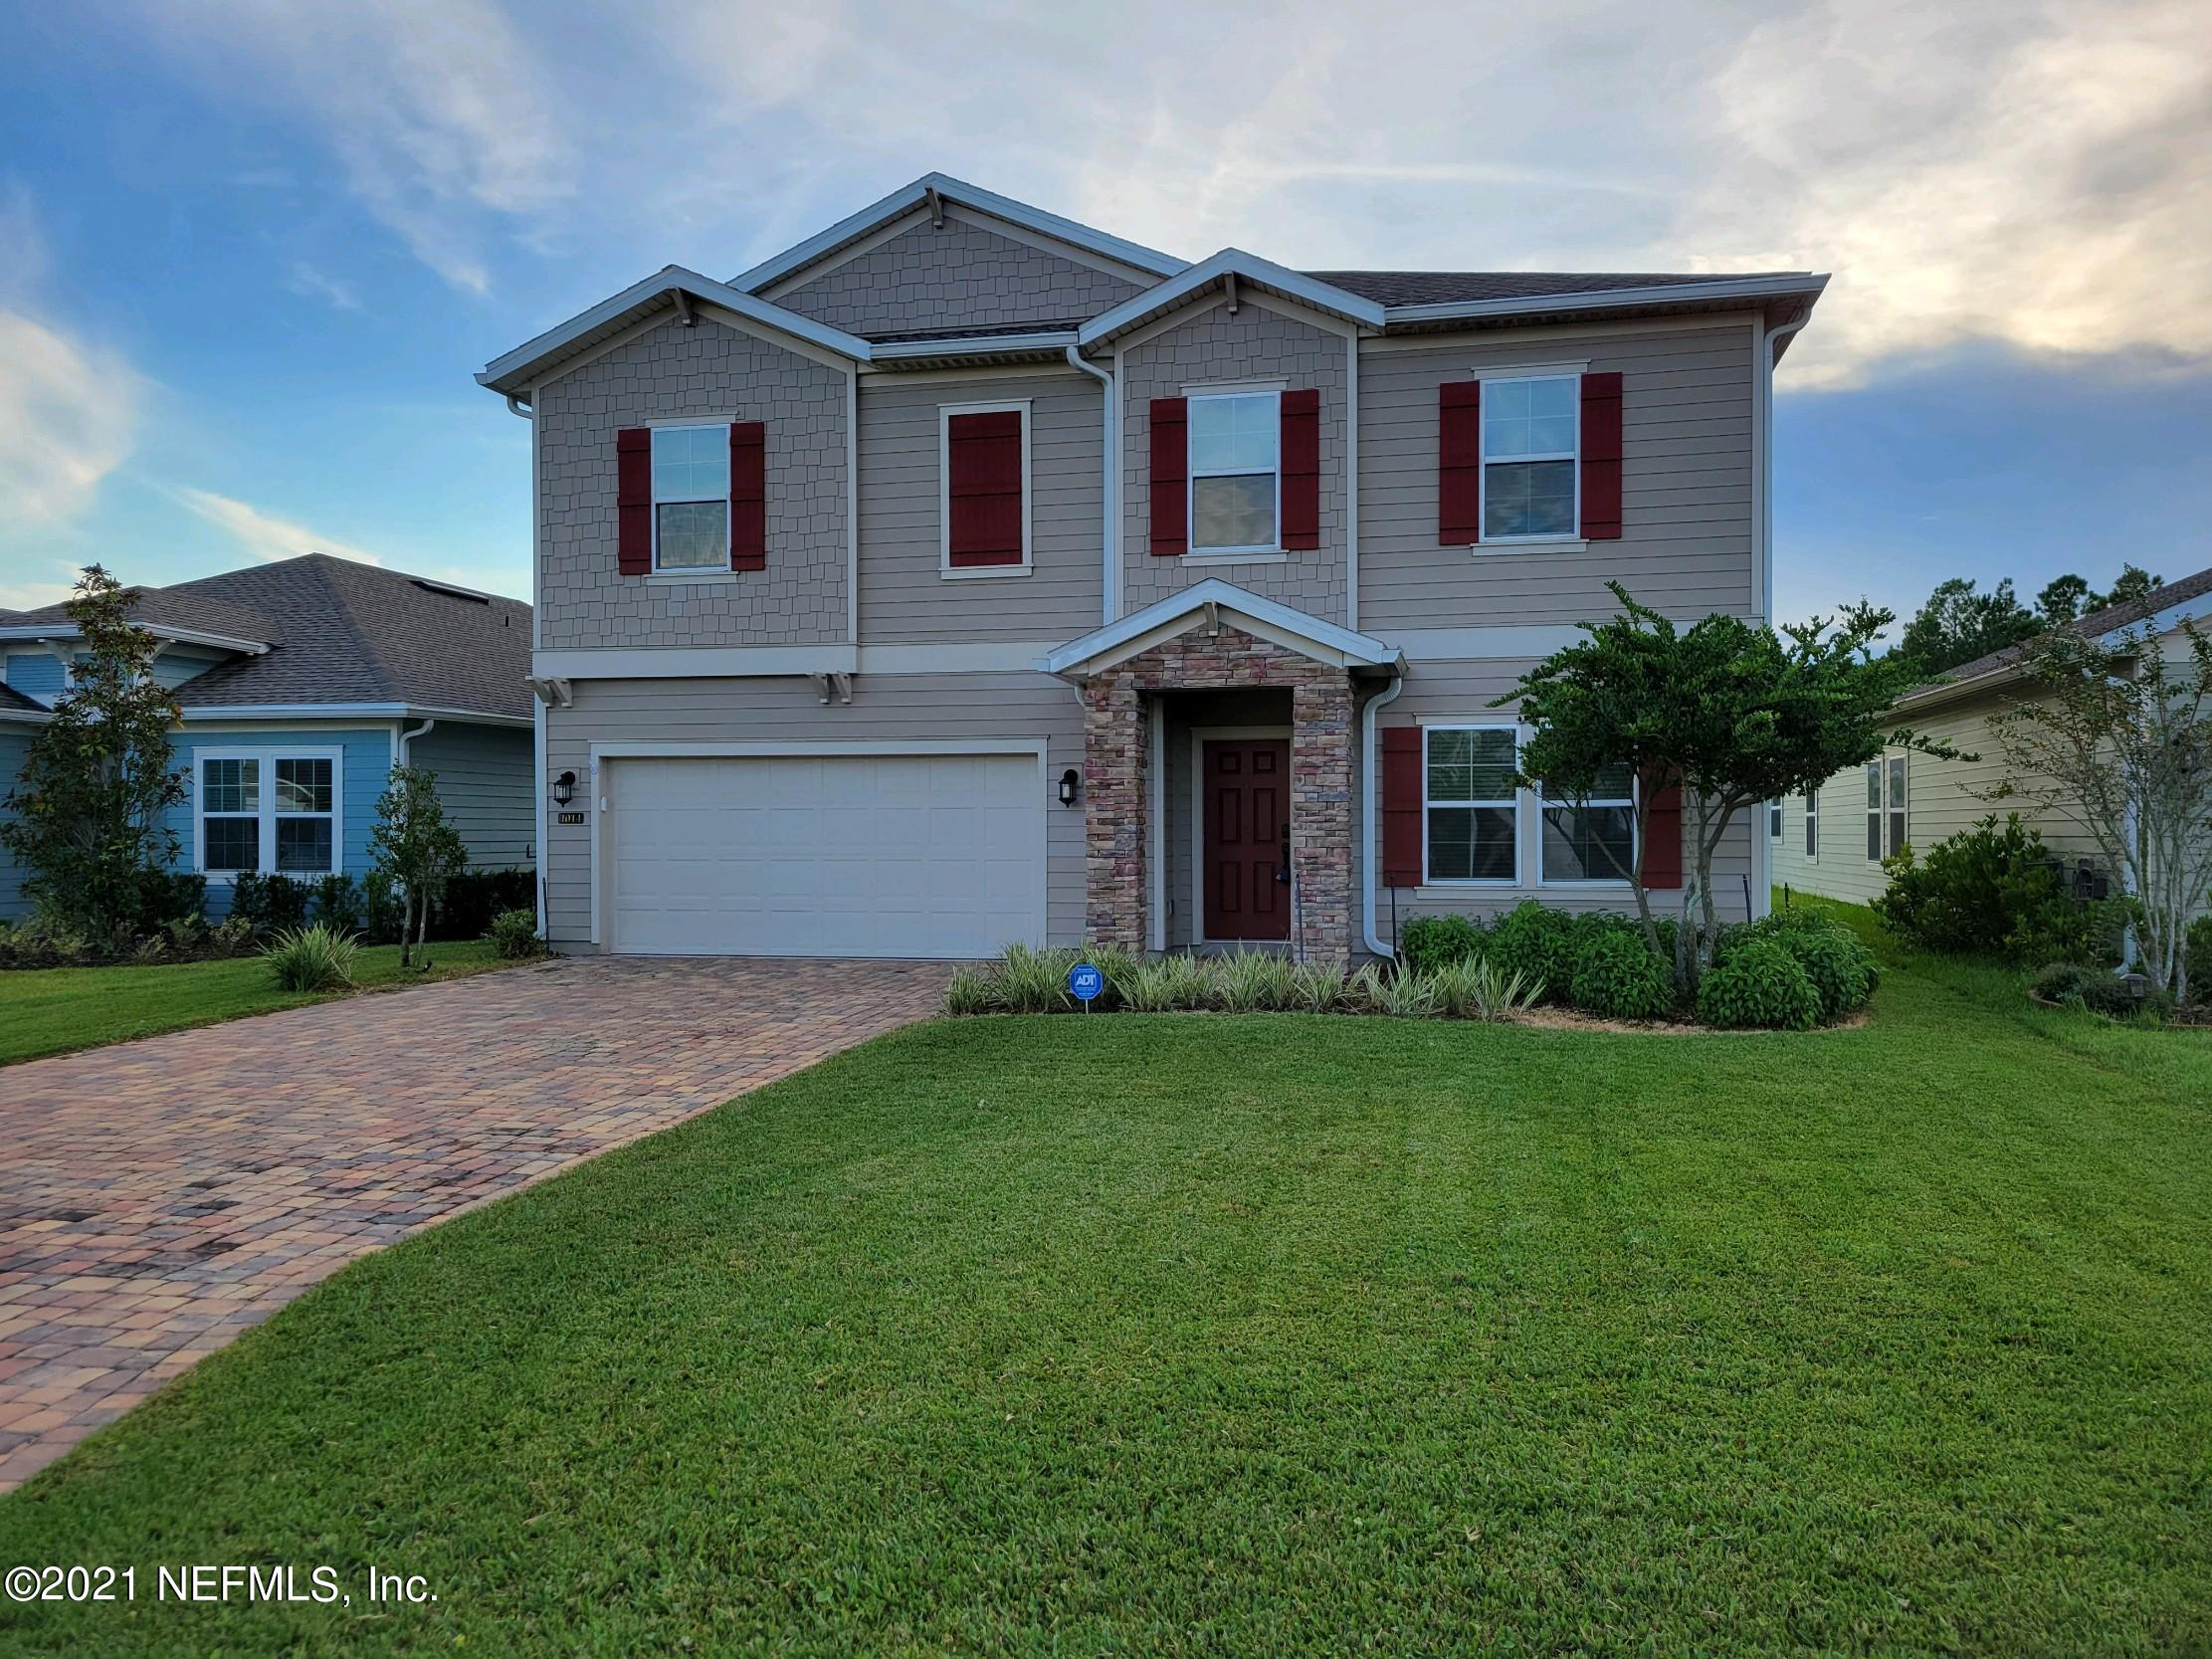 4014 ARBOR MILL, ORANGE PARK, FLORIDA 32065, 4 Bedrooms Bedrooms, ,2 BathroomsBathrooms,Residential,For sale,ARBOR MILL,1132938